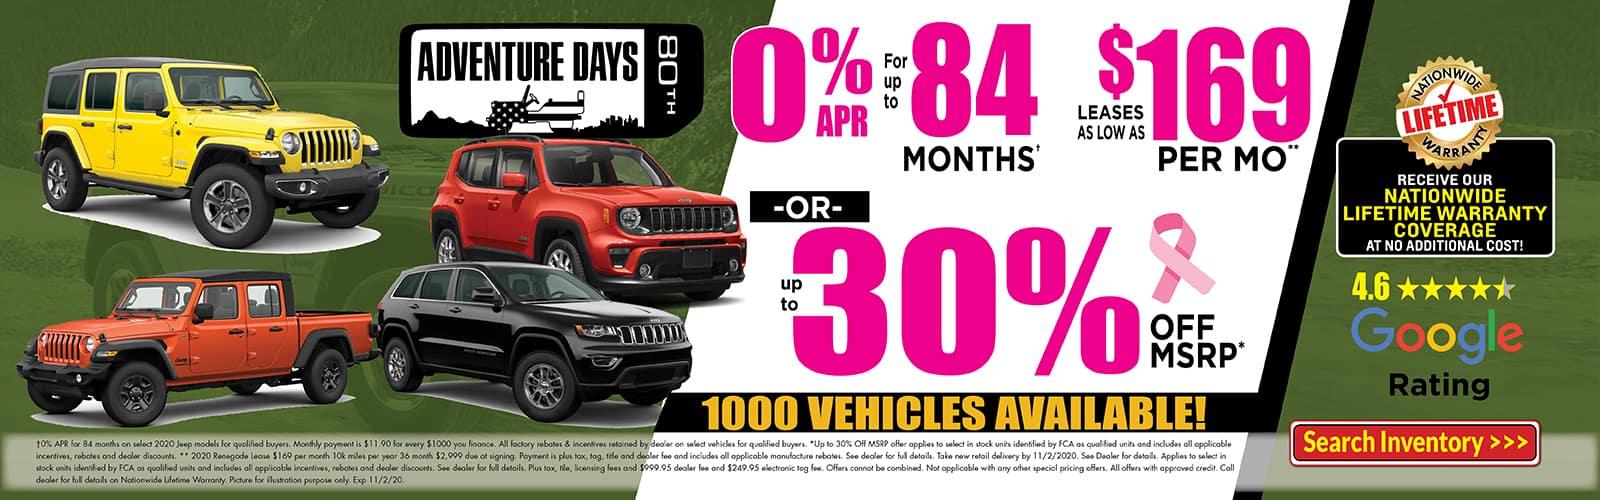 Jim Browne CJDR Jeep 1600×500 Slide 10_1_20